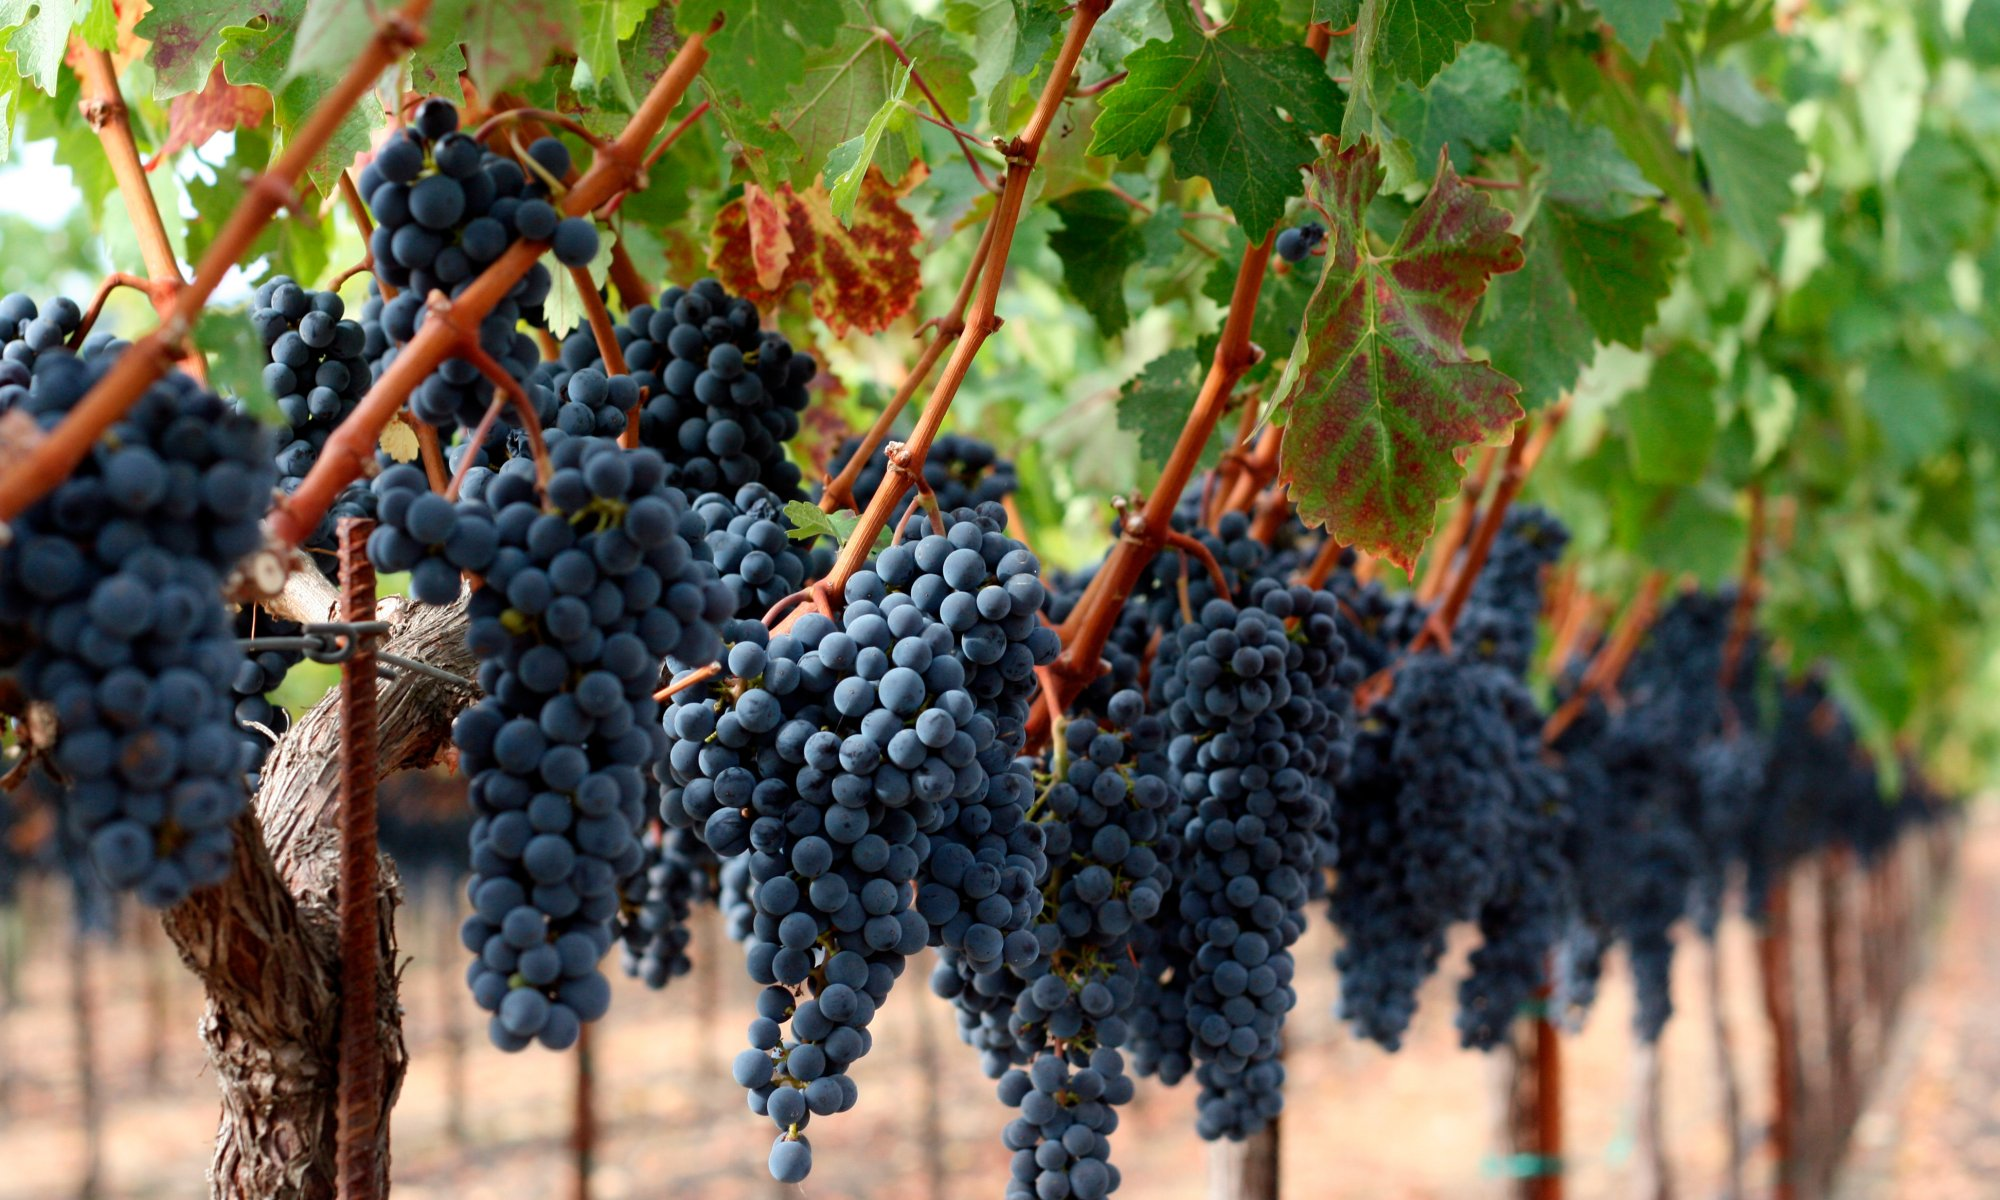 Grapes on the vine at a Napa Valley vineyard.